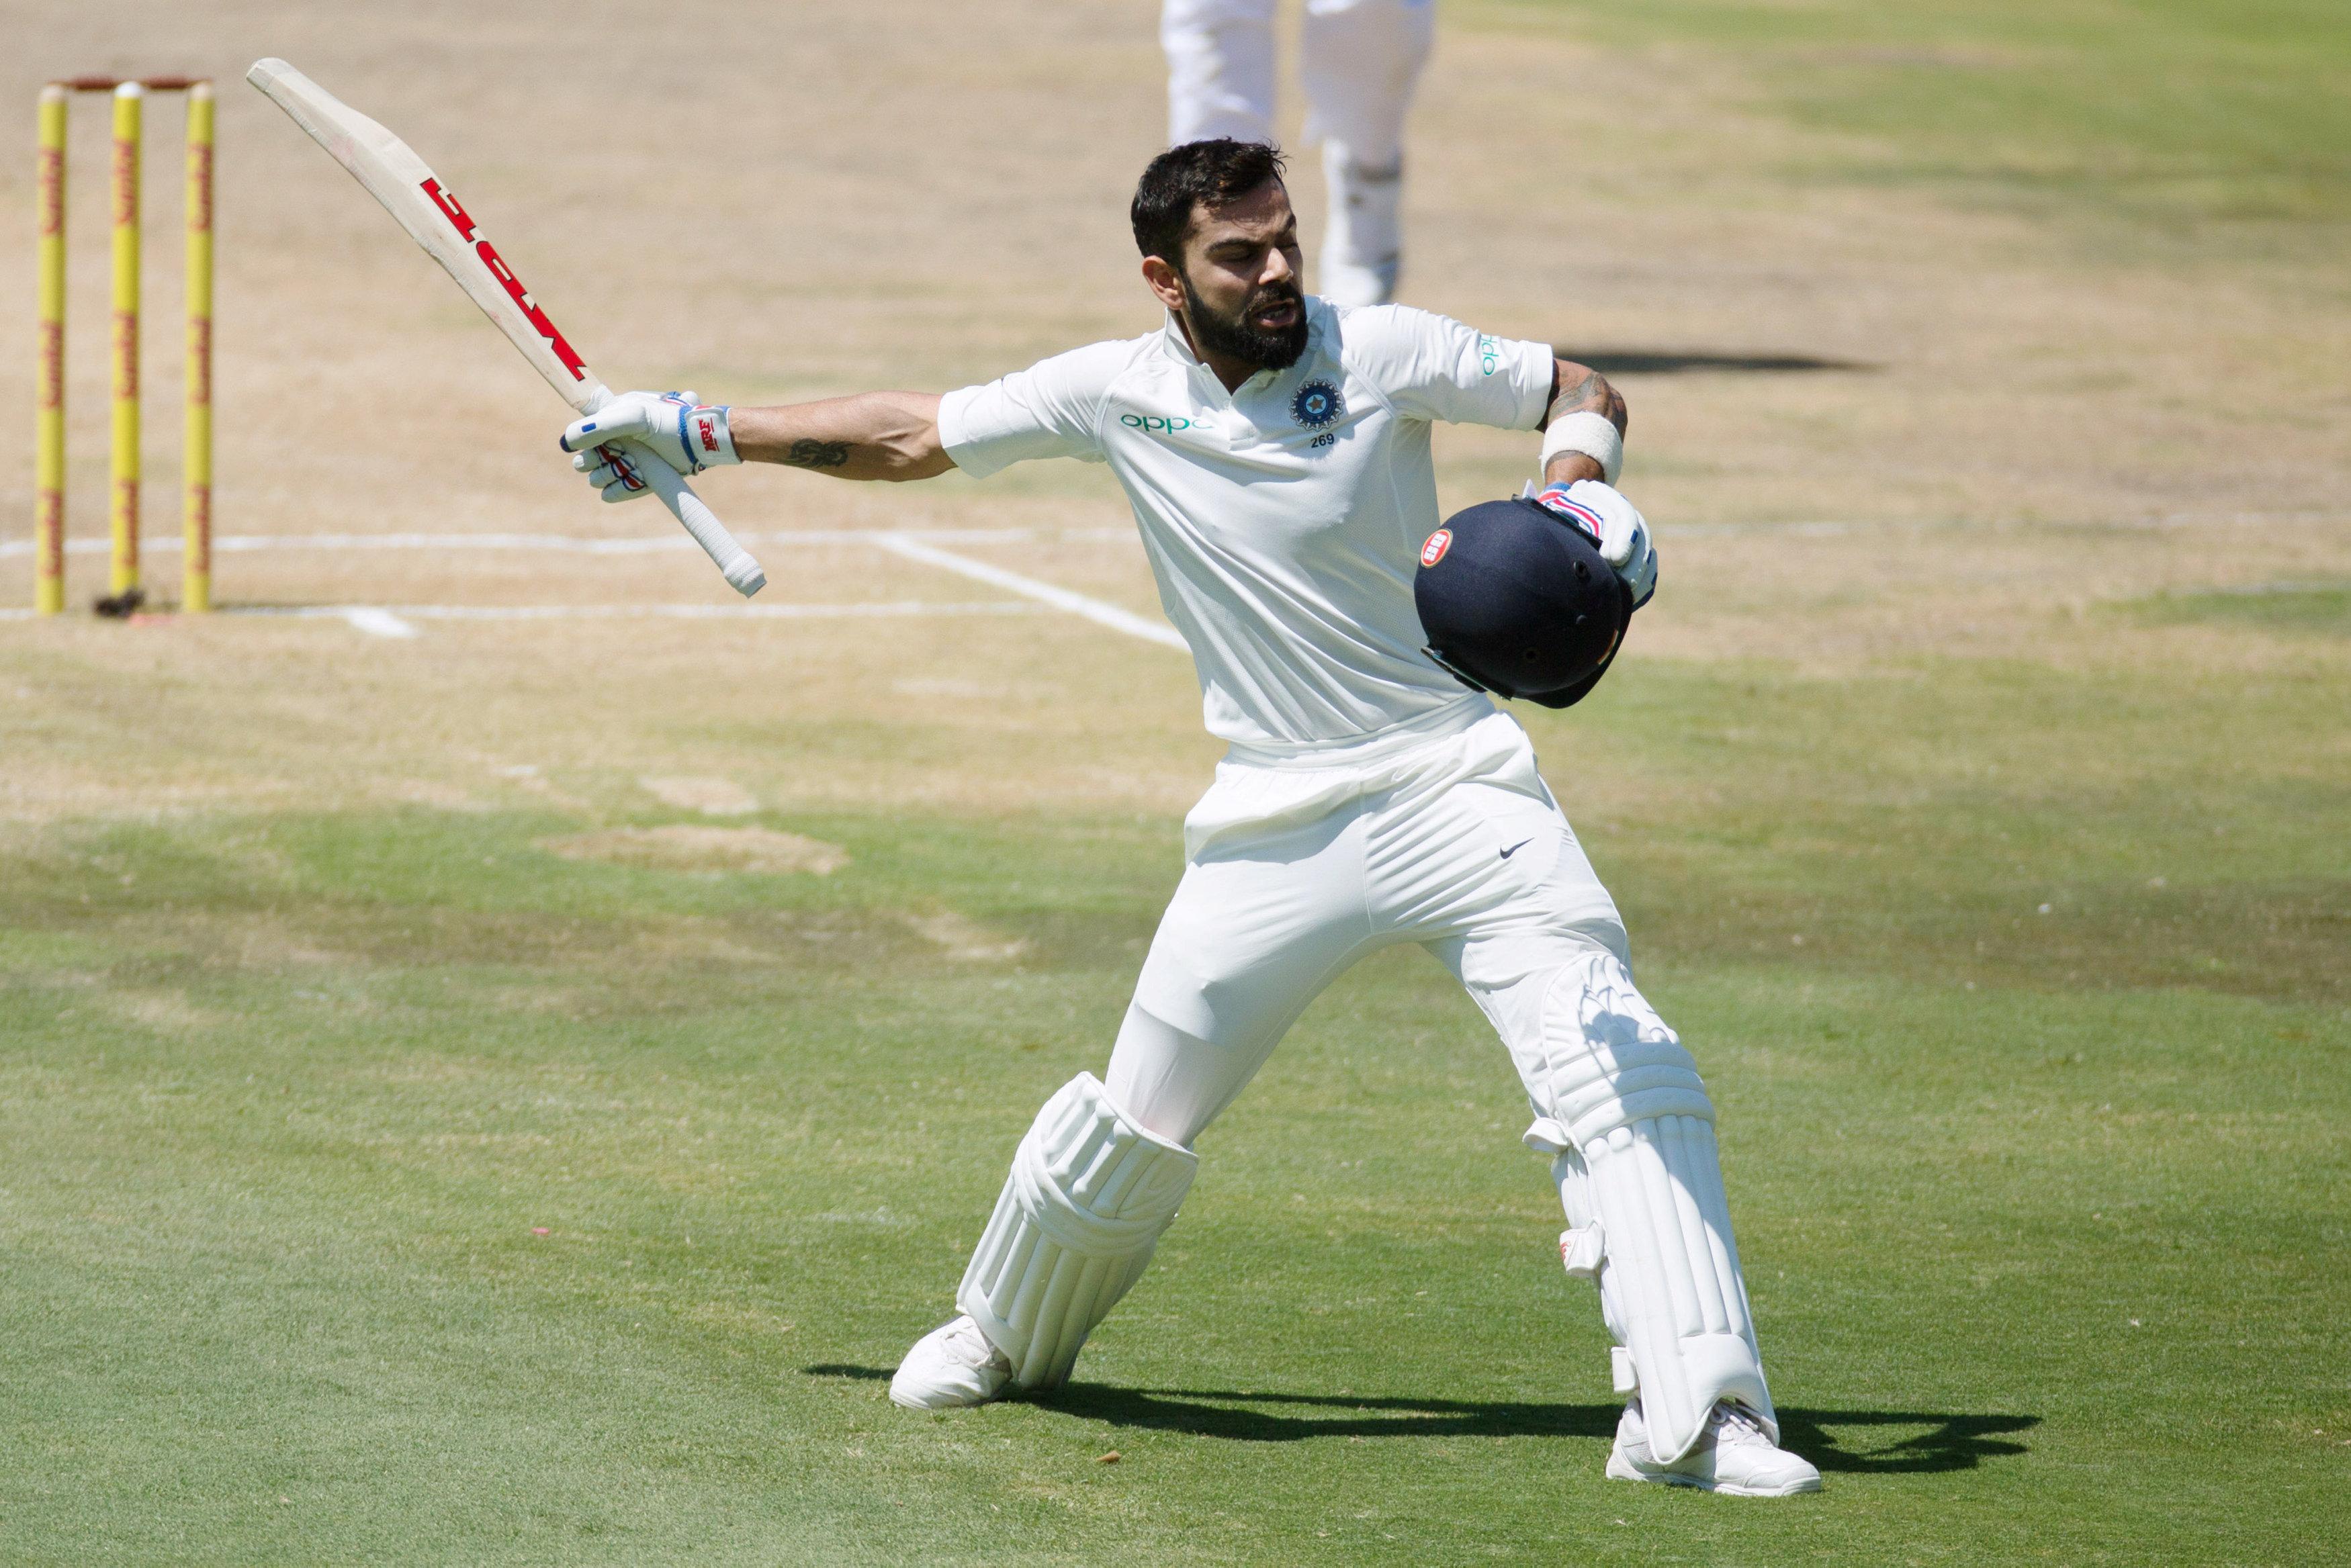 South Africa extend lead after Virat Kohli's ton